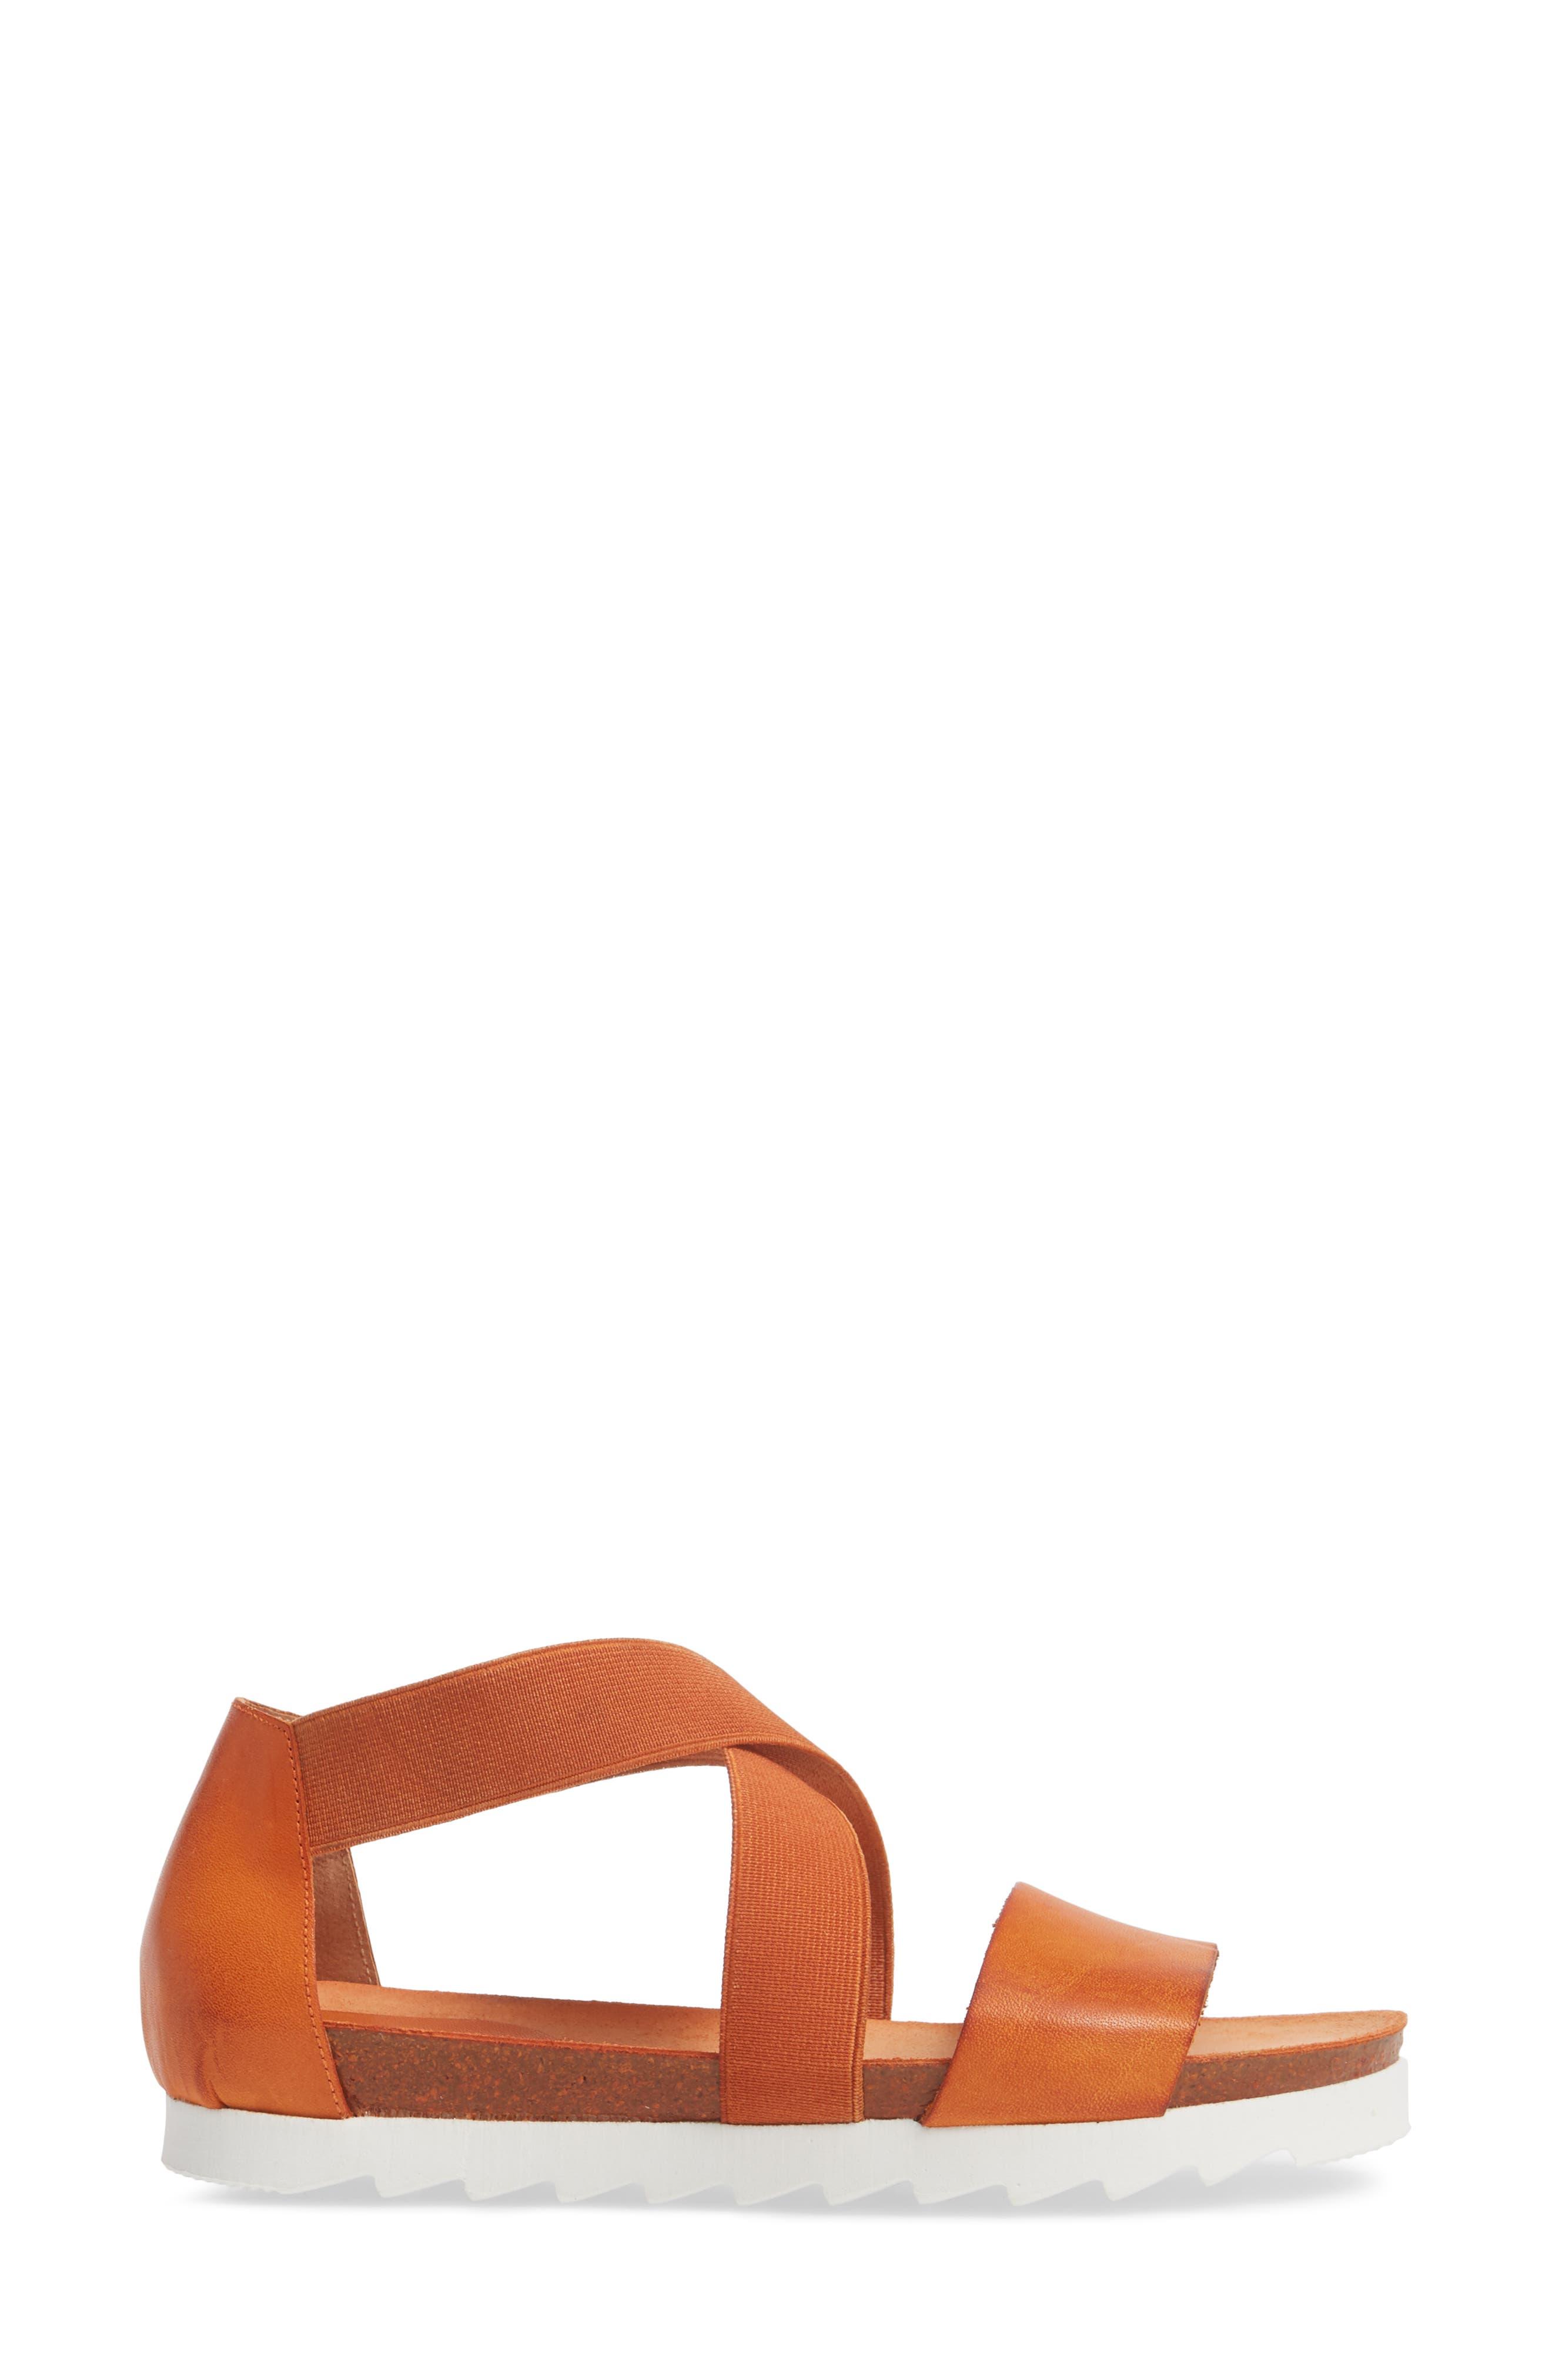 Sayger Sandal,                             Alternate thumbnail 3, color,                             Orange Leather